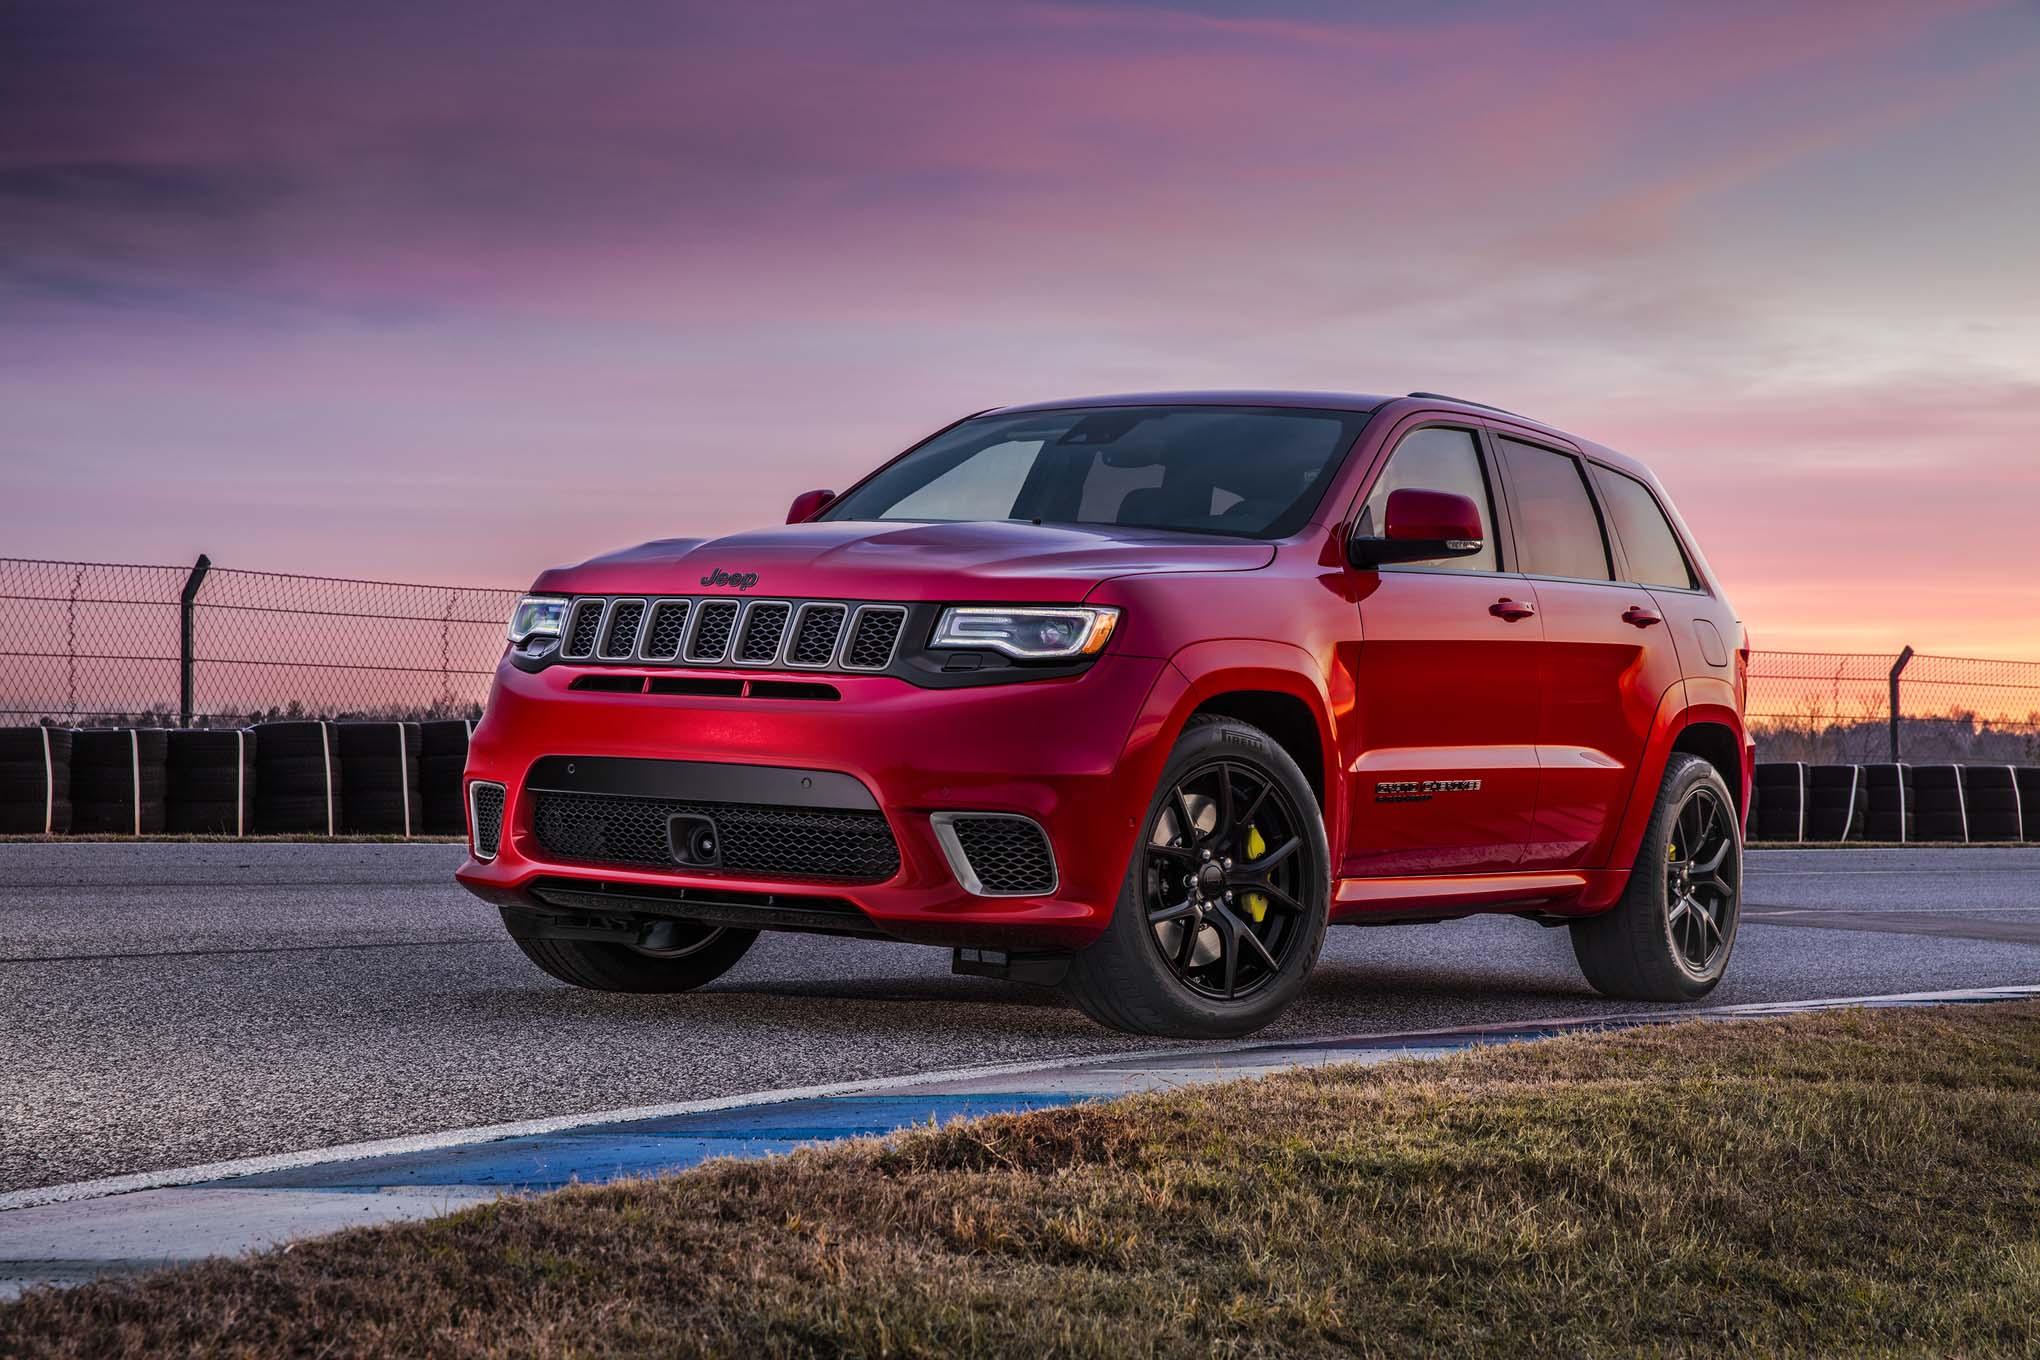 2018 Jeep Grand Cherokee Trackhawk Front Three Quarter 02